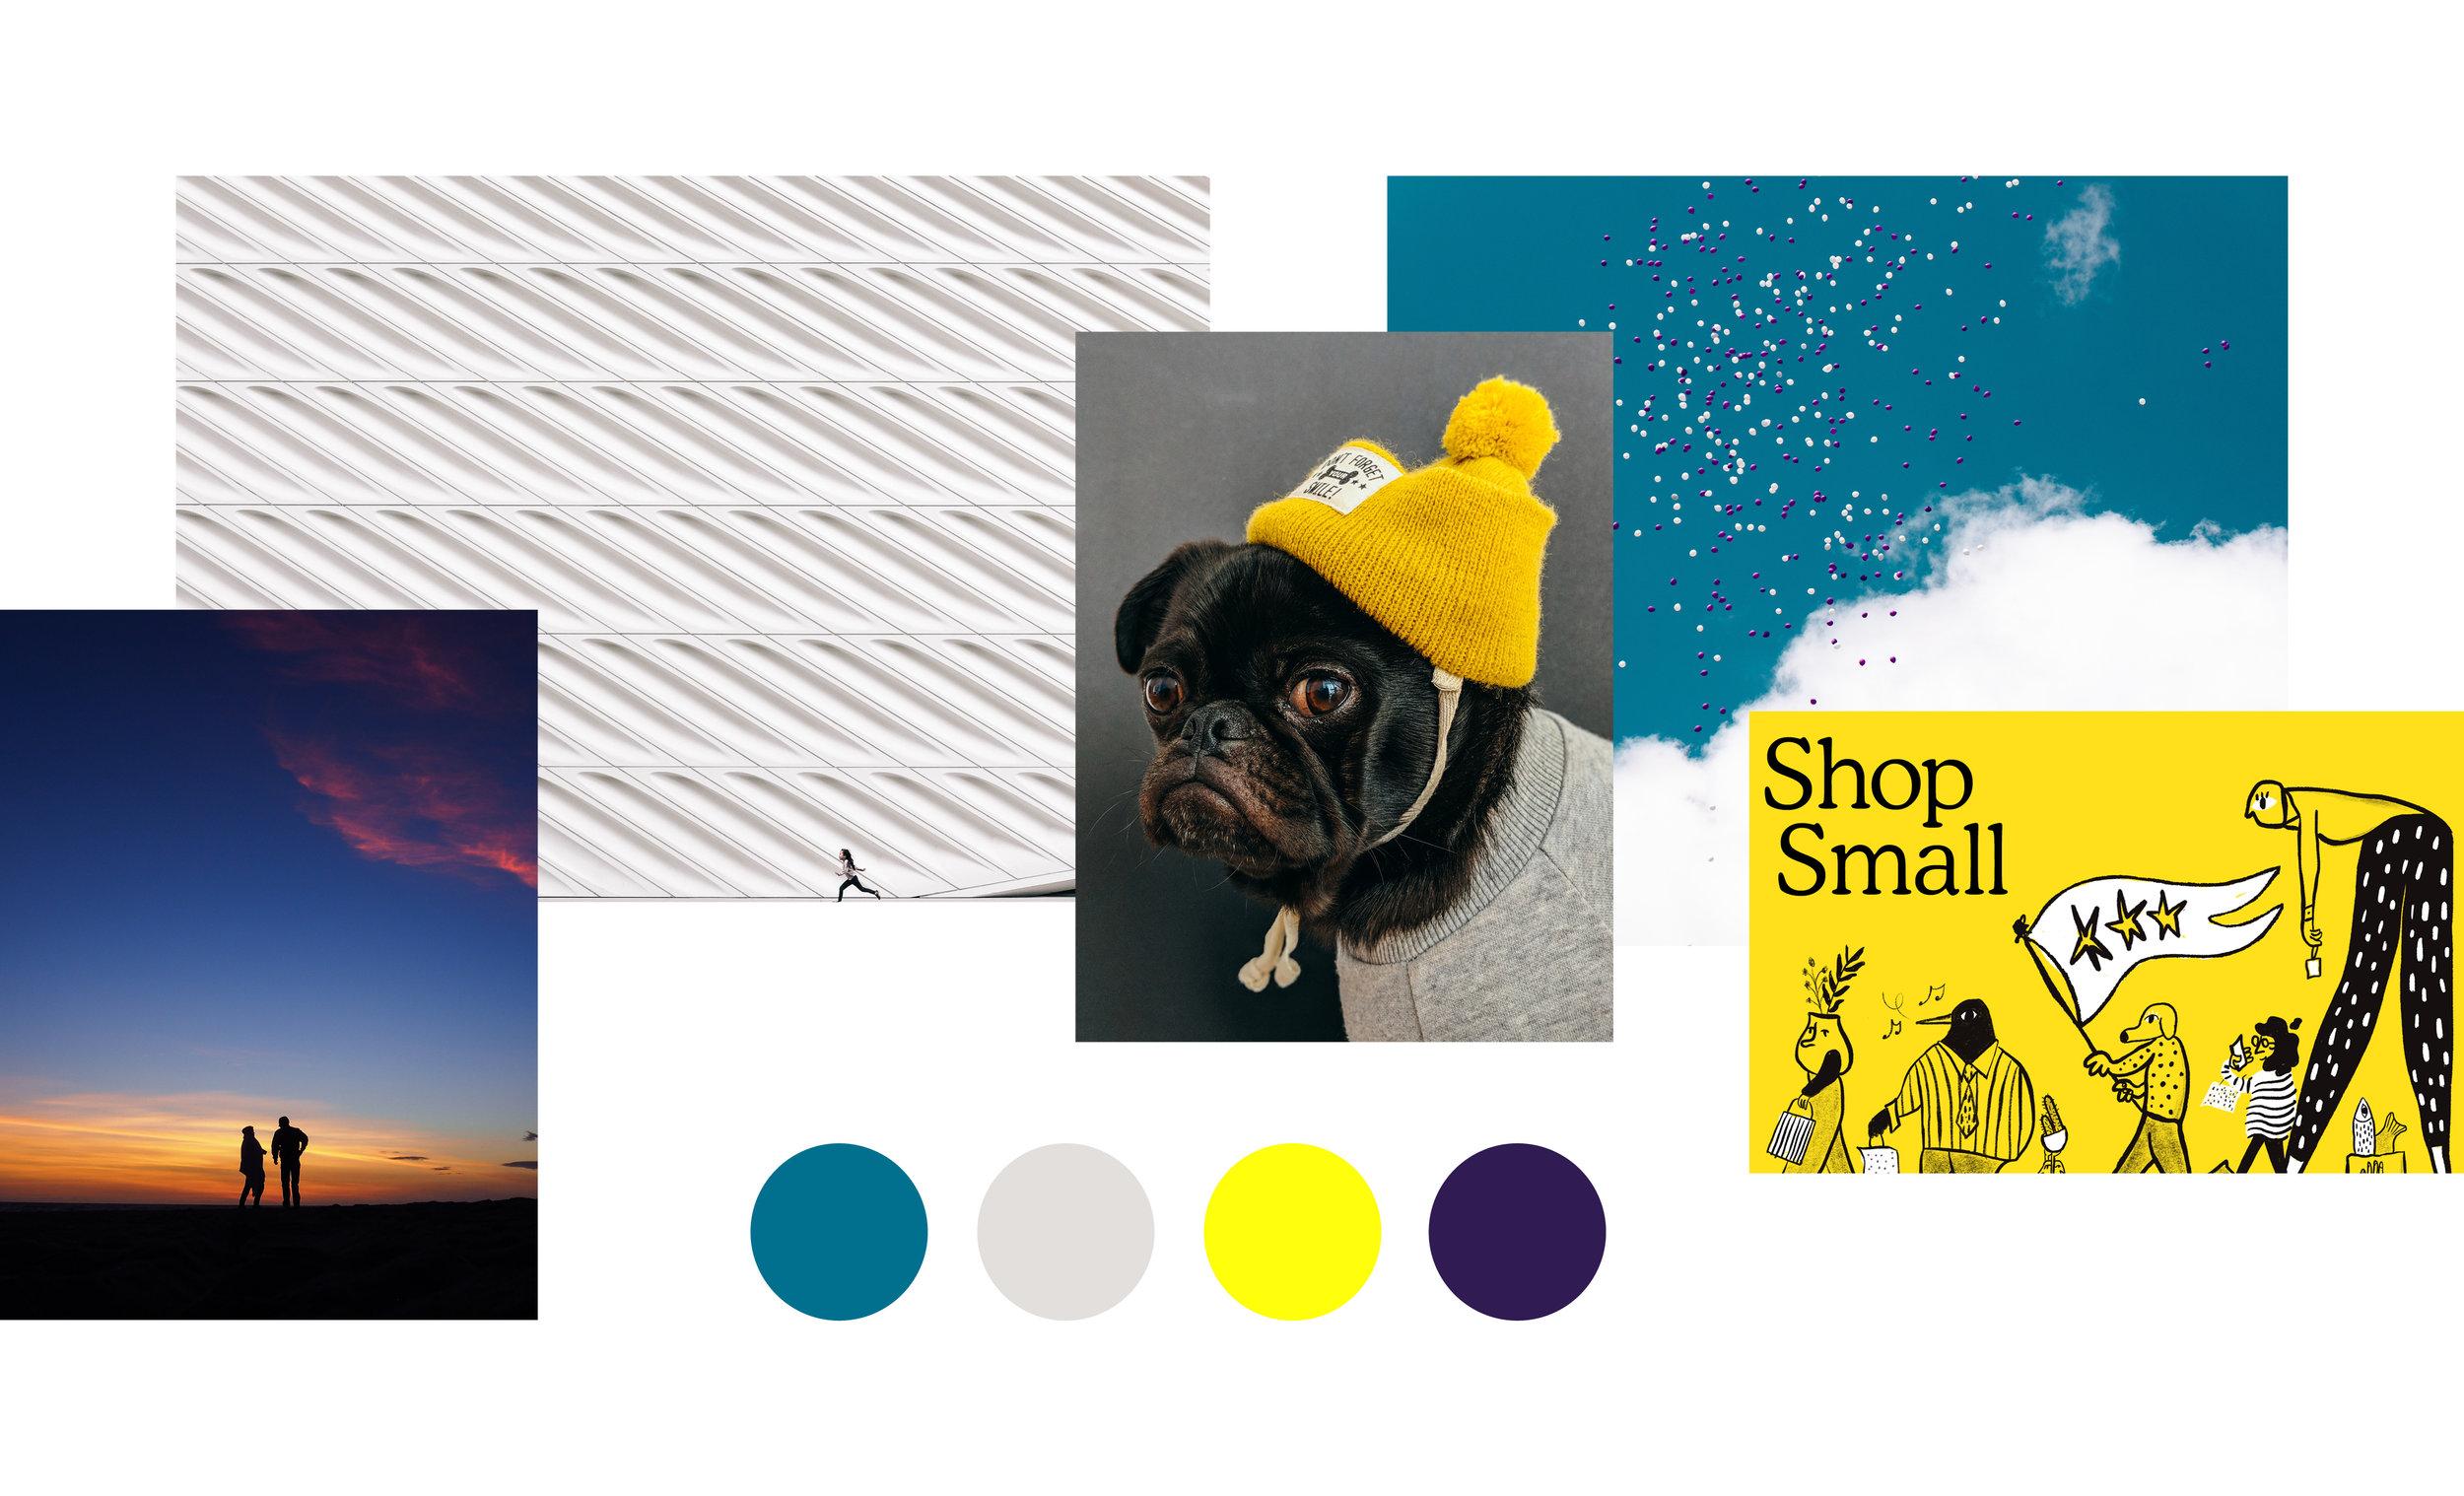 Brand-Explorations-ArtDirection3.jpg